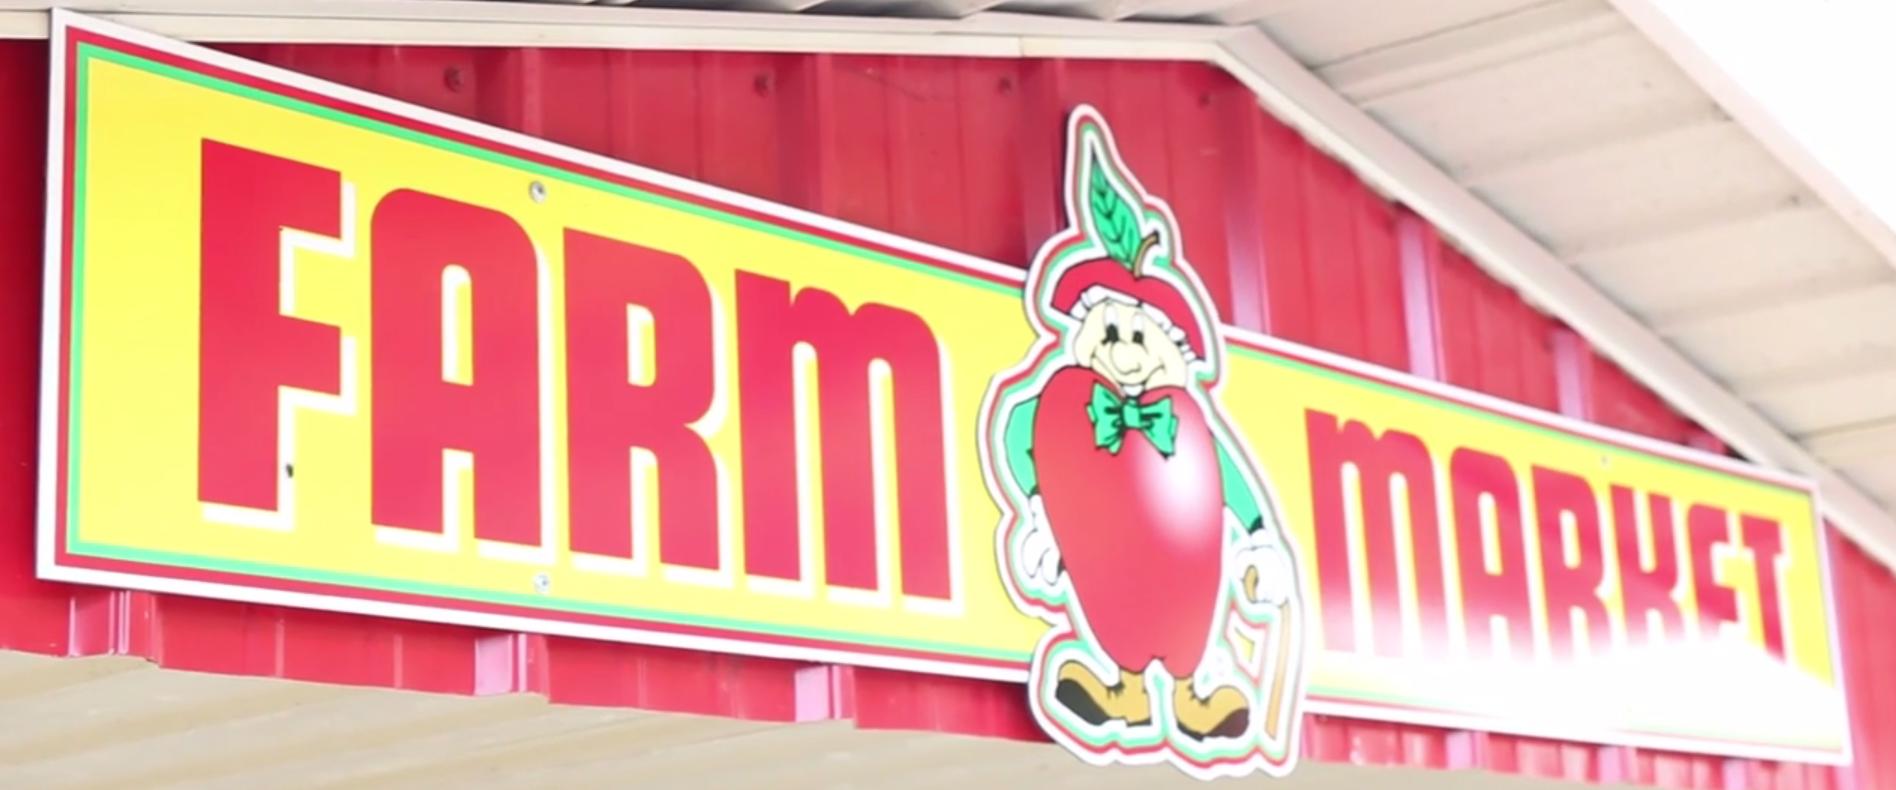 Moreland Fruit Farm image 0